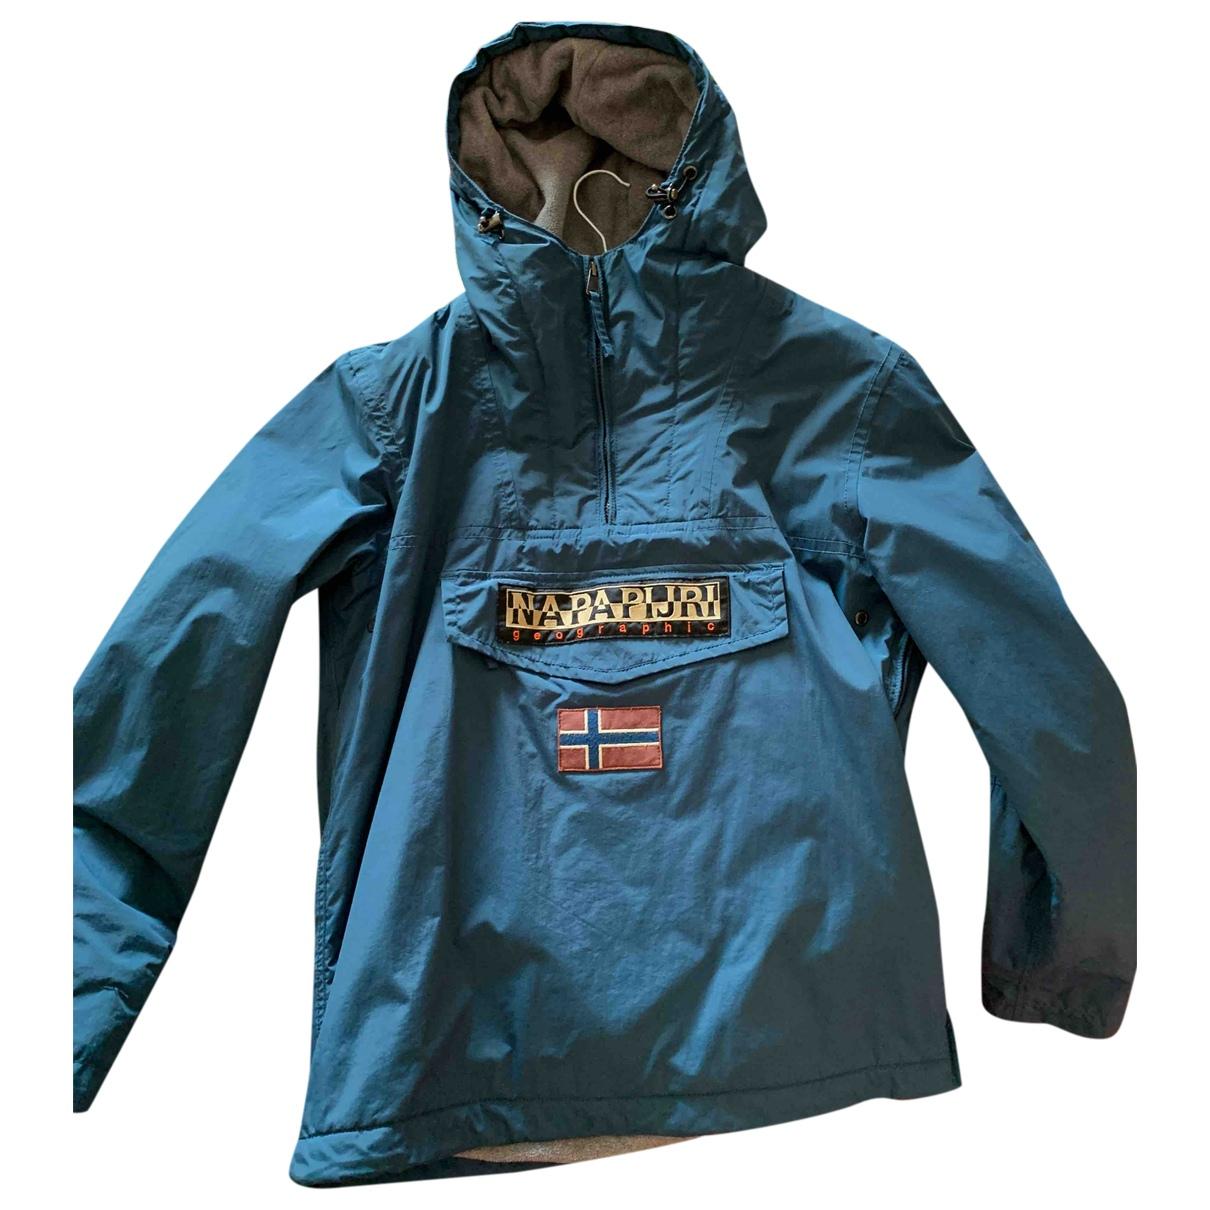 Napapijri \N Turquoise jacket  for Men S International